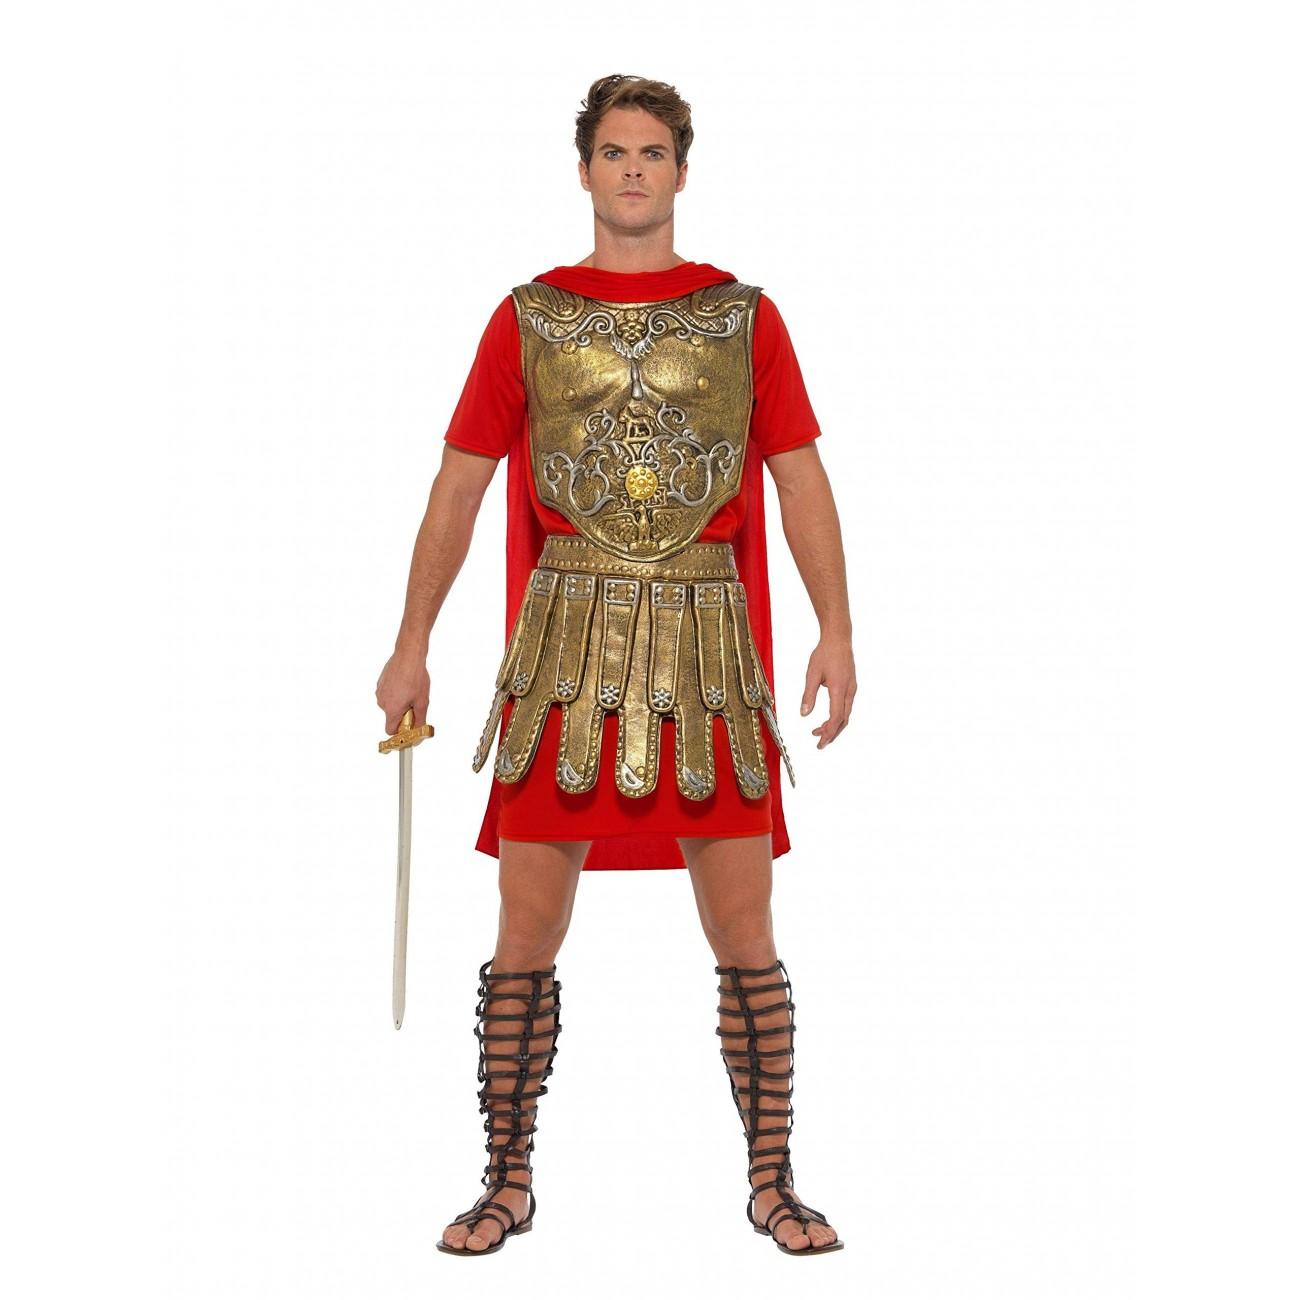 Smiffy's 40377M Disfraz de Gladiador Romano, Hombre